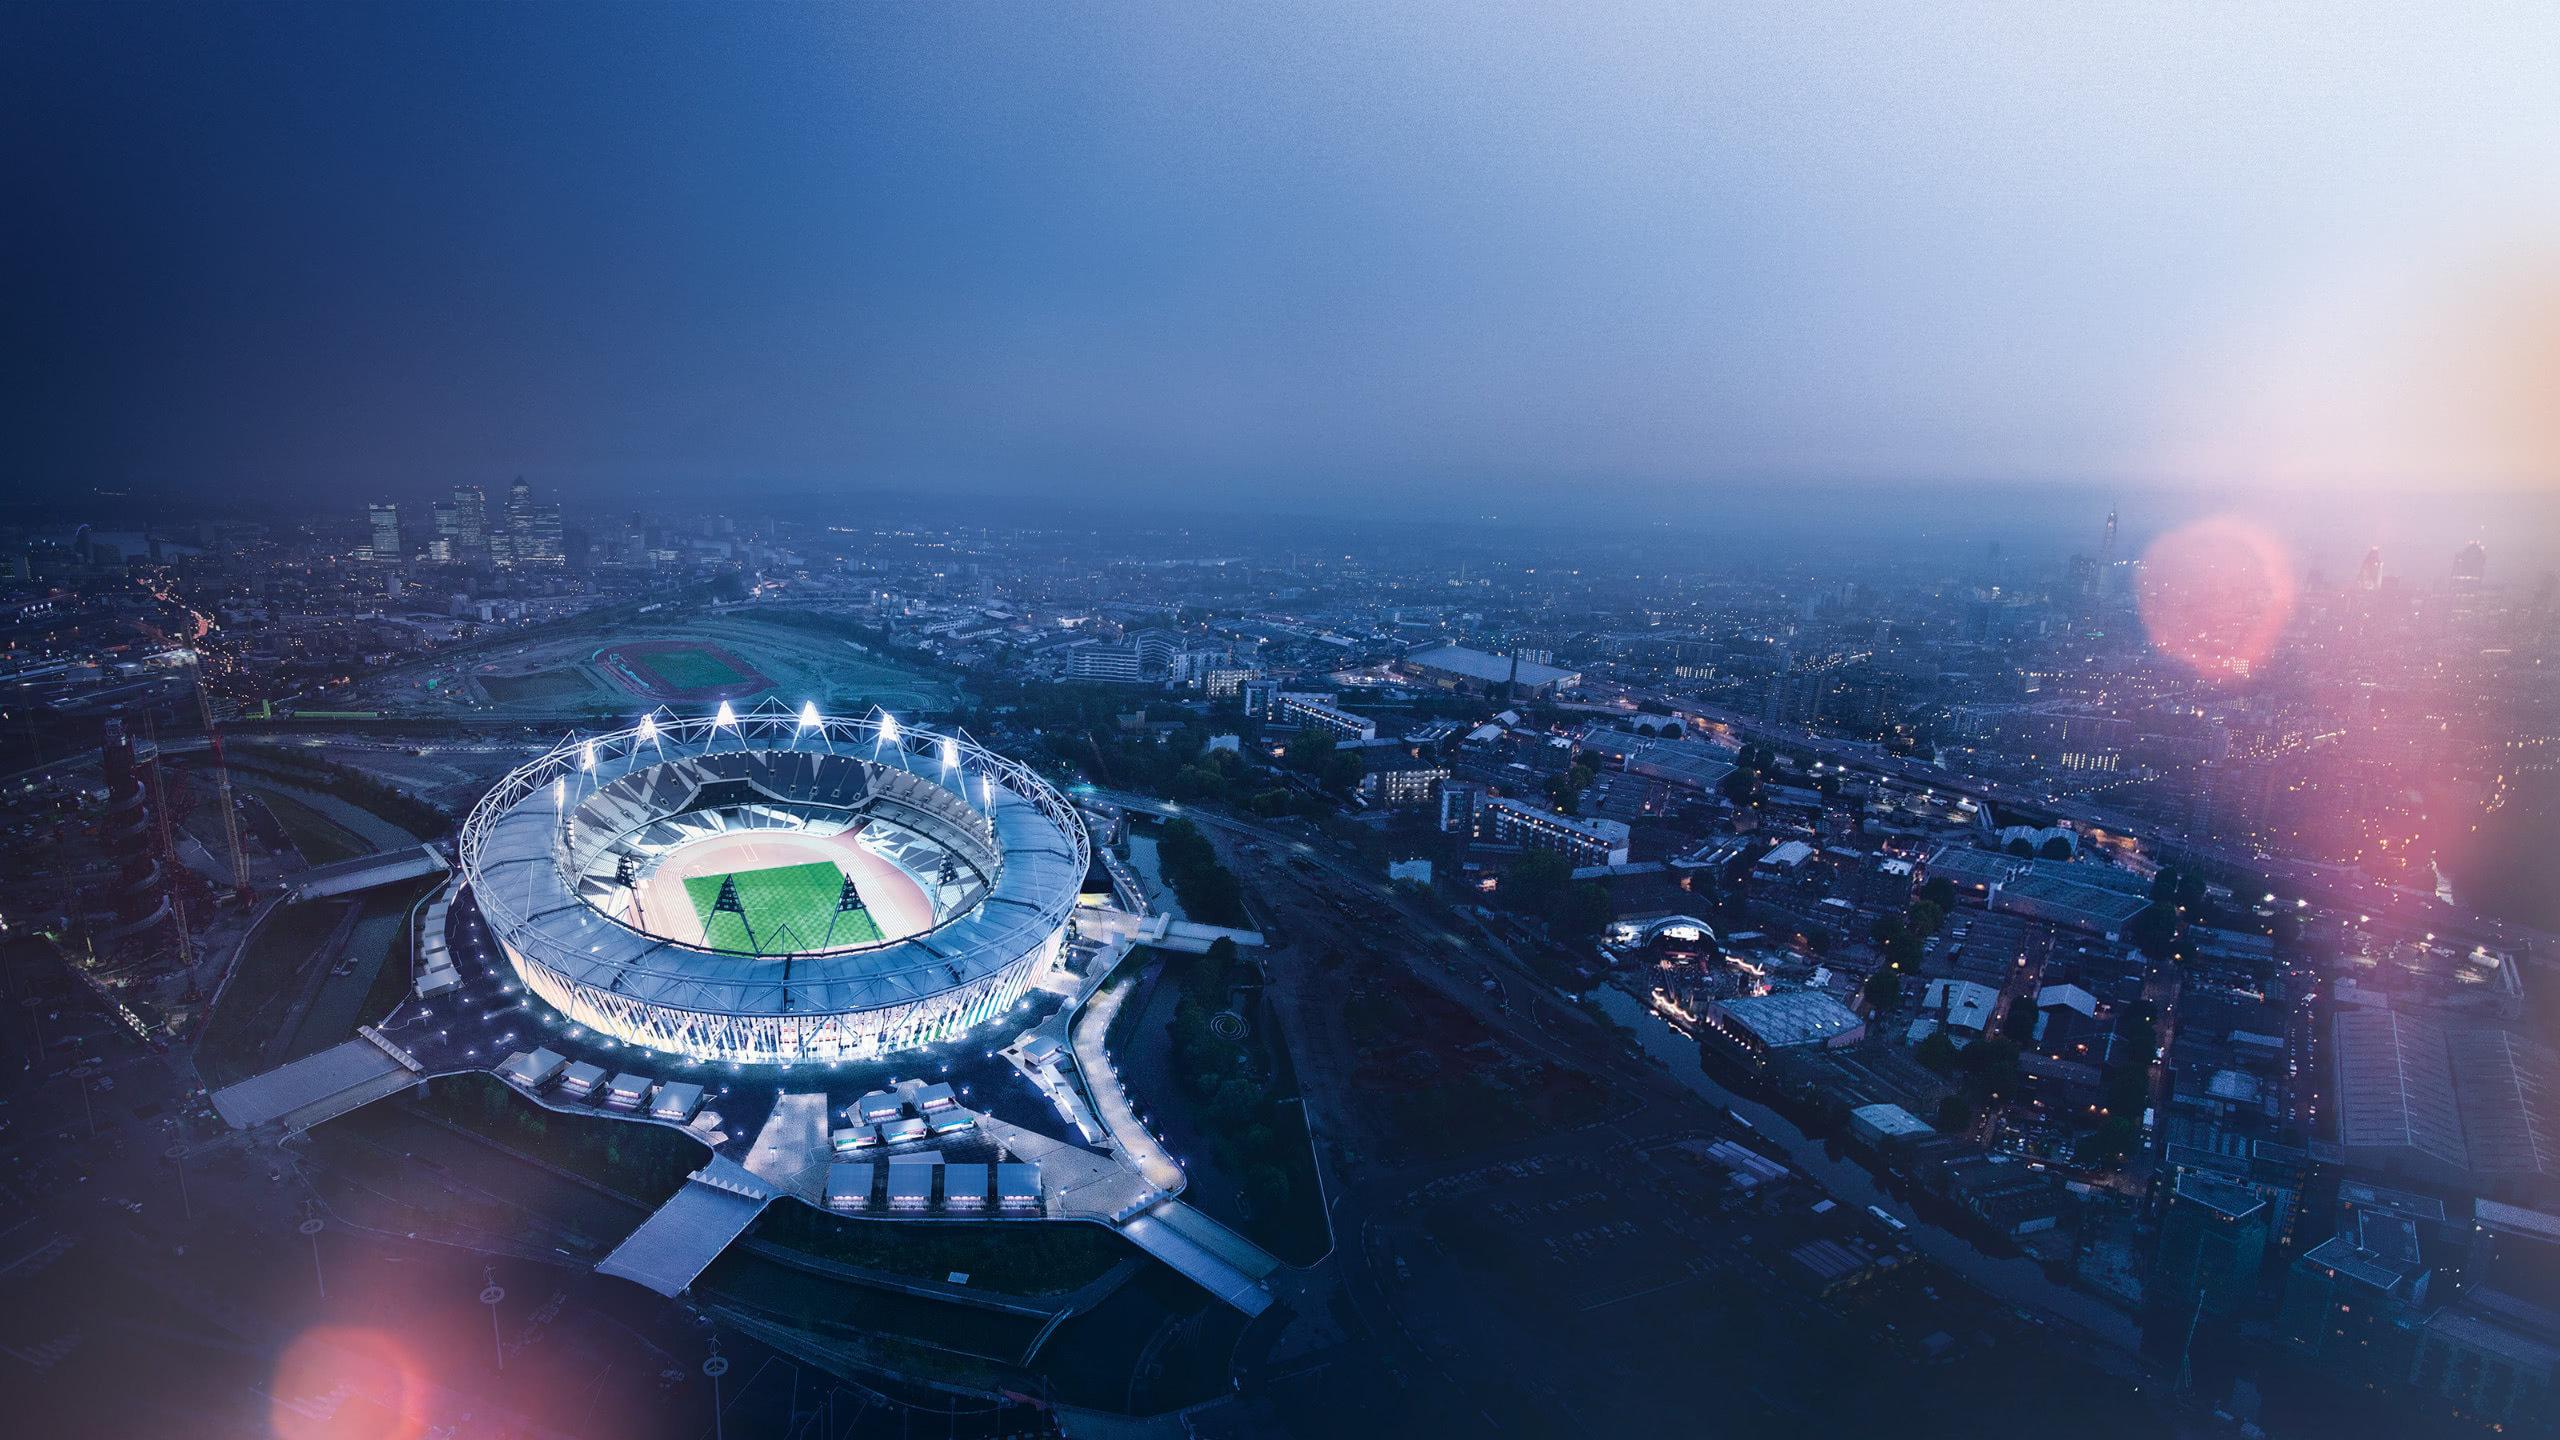 london olympic stadium 2012 olympics london england wqhd 1440p wallpaper